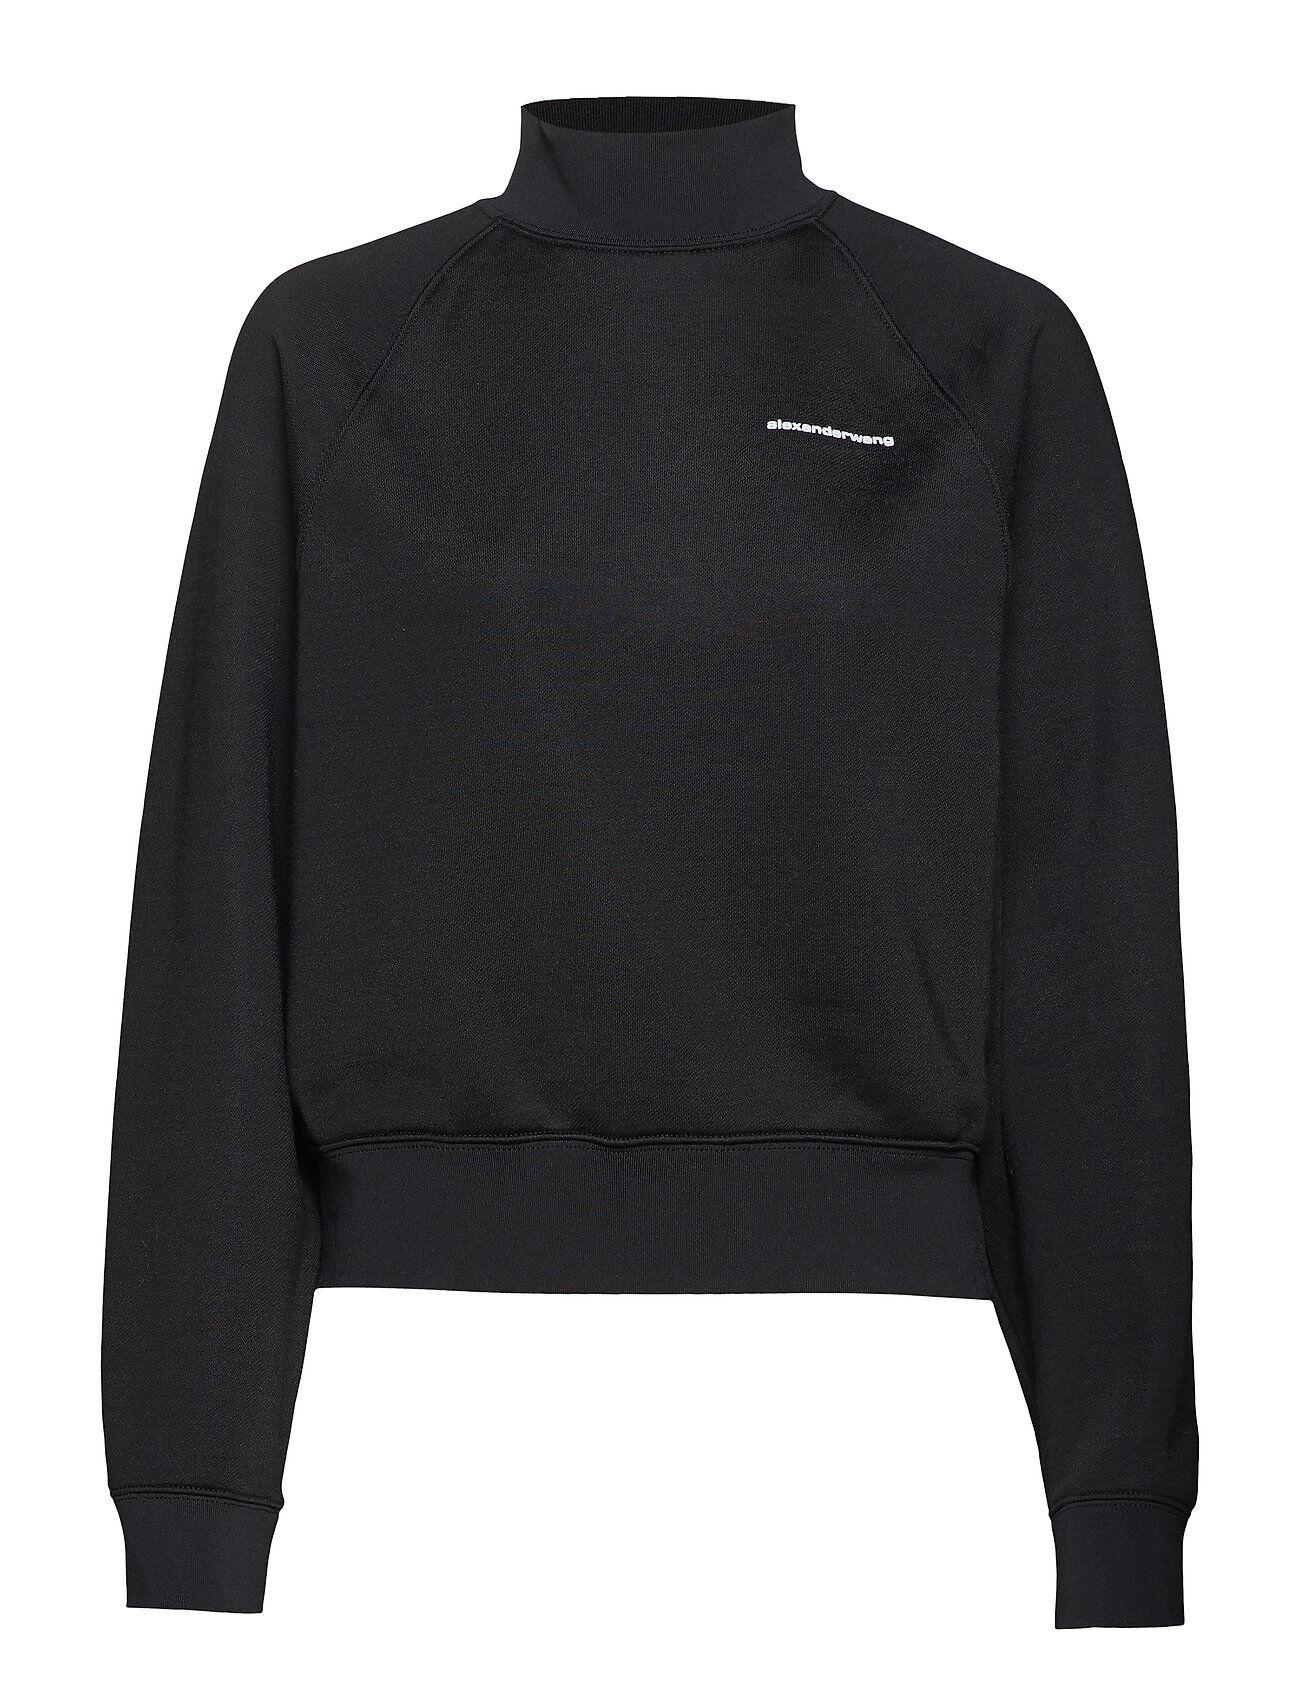 T by Alexander Wang Heavy Sleek French Terry Turtle Neck Sweatshirt